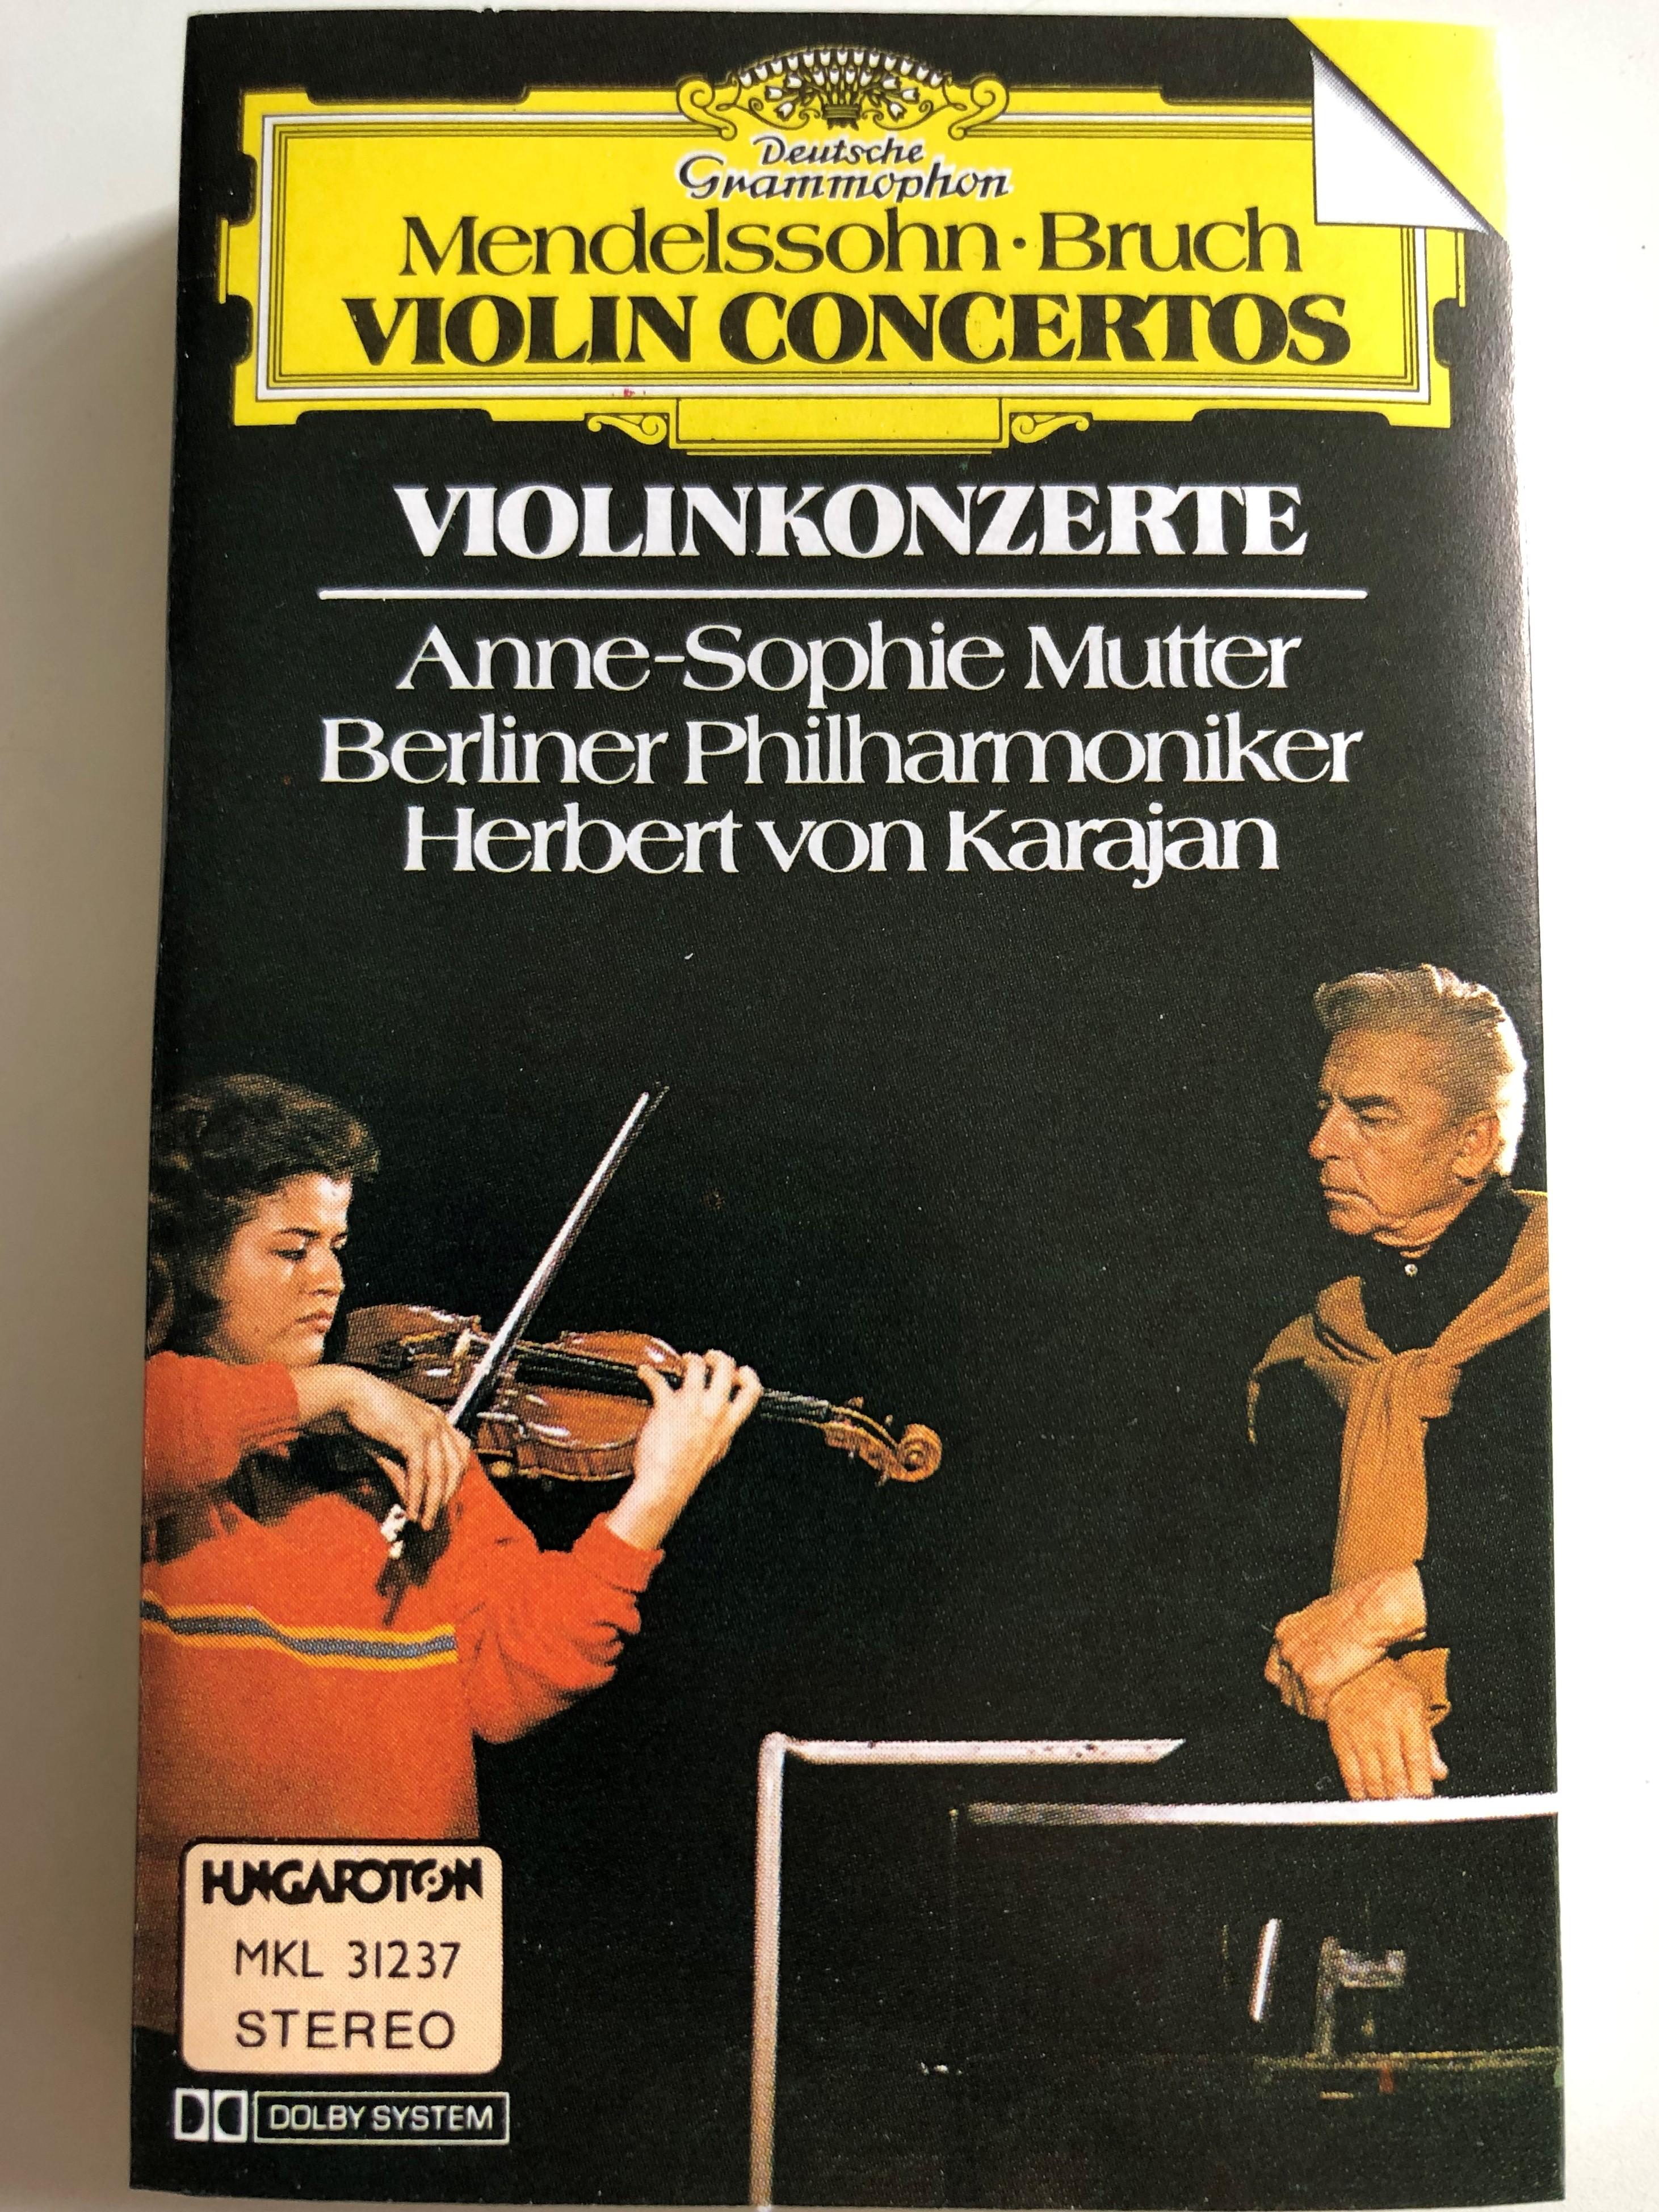 mendelssohn-bruch-violinkonzerte-anne-sophie-mutter-berliner-philharmoniker-conducted-herbert-von-karajan-deutsche-grammophon-hungaroton-cassette-stereo-mkl-31237-1-.jpg